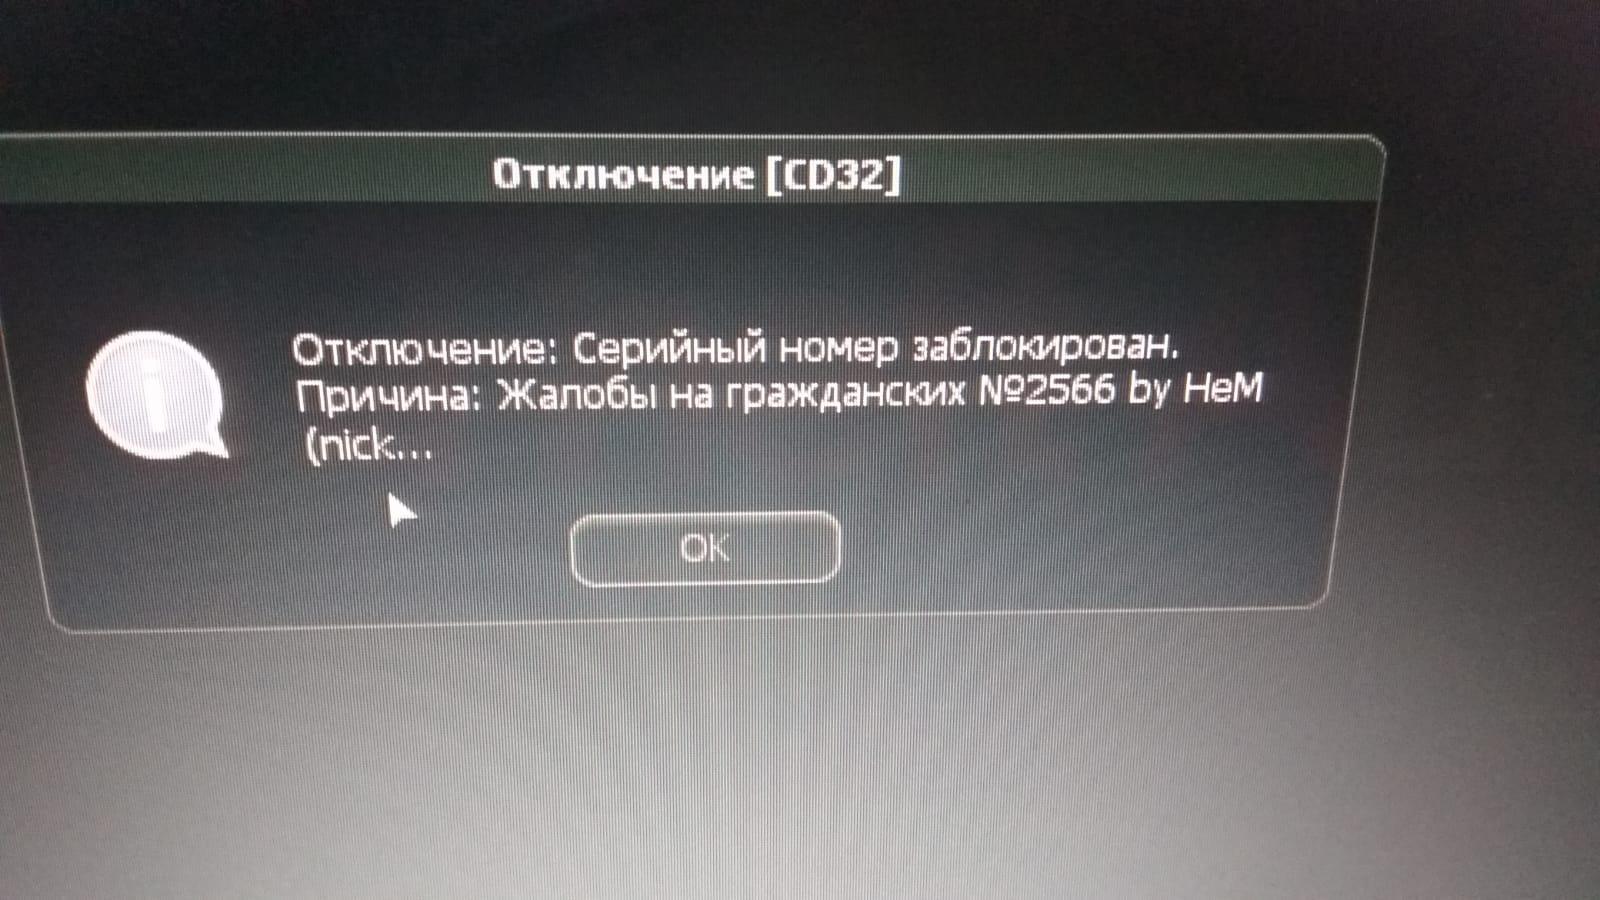 eRshitp6w_A.jpg